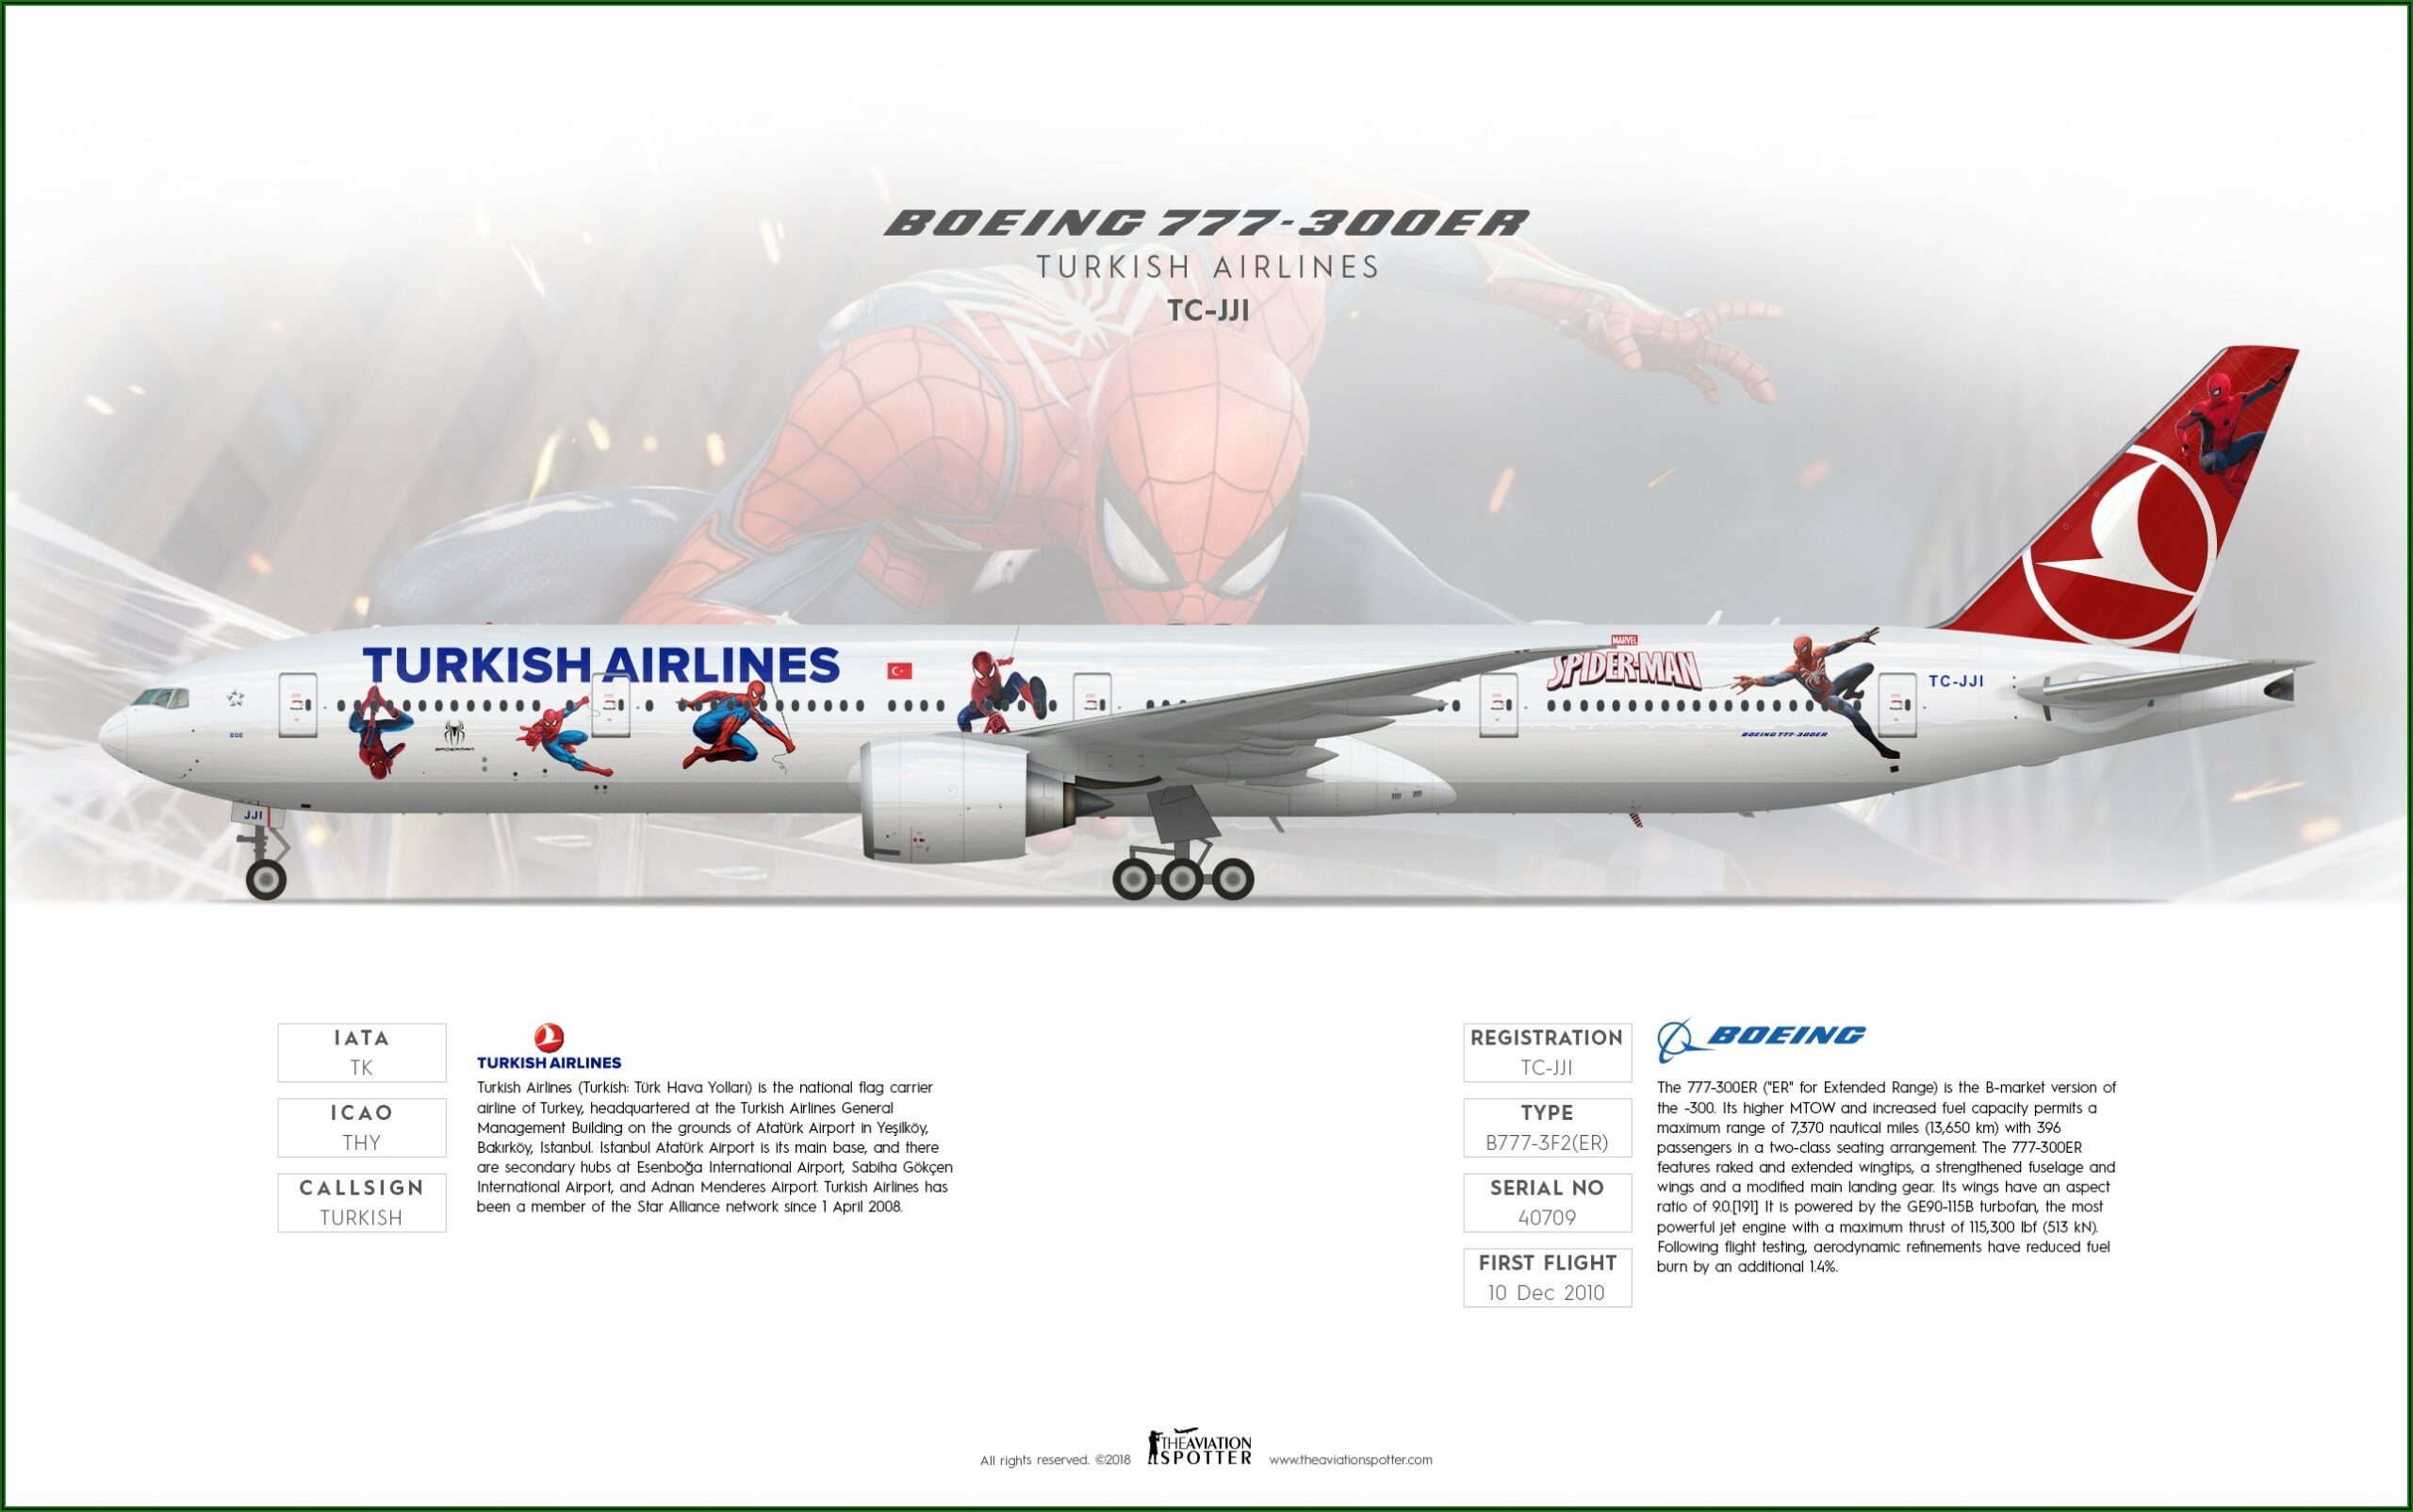 B777 300er Seat Map Turkish Airlines